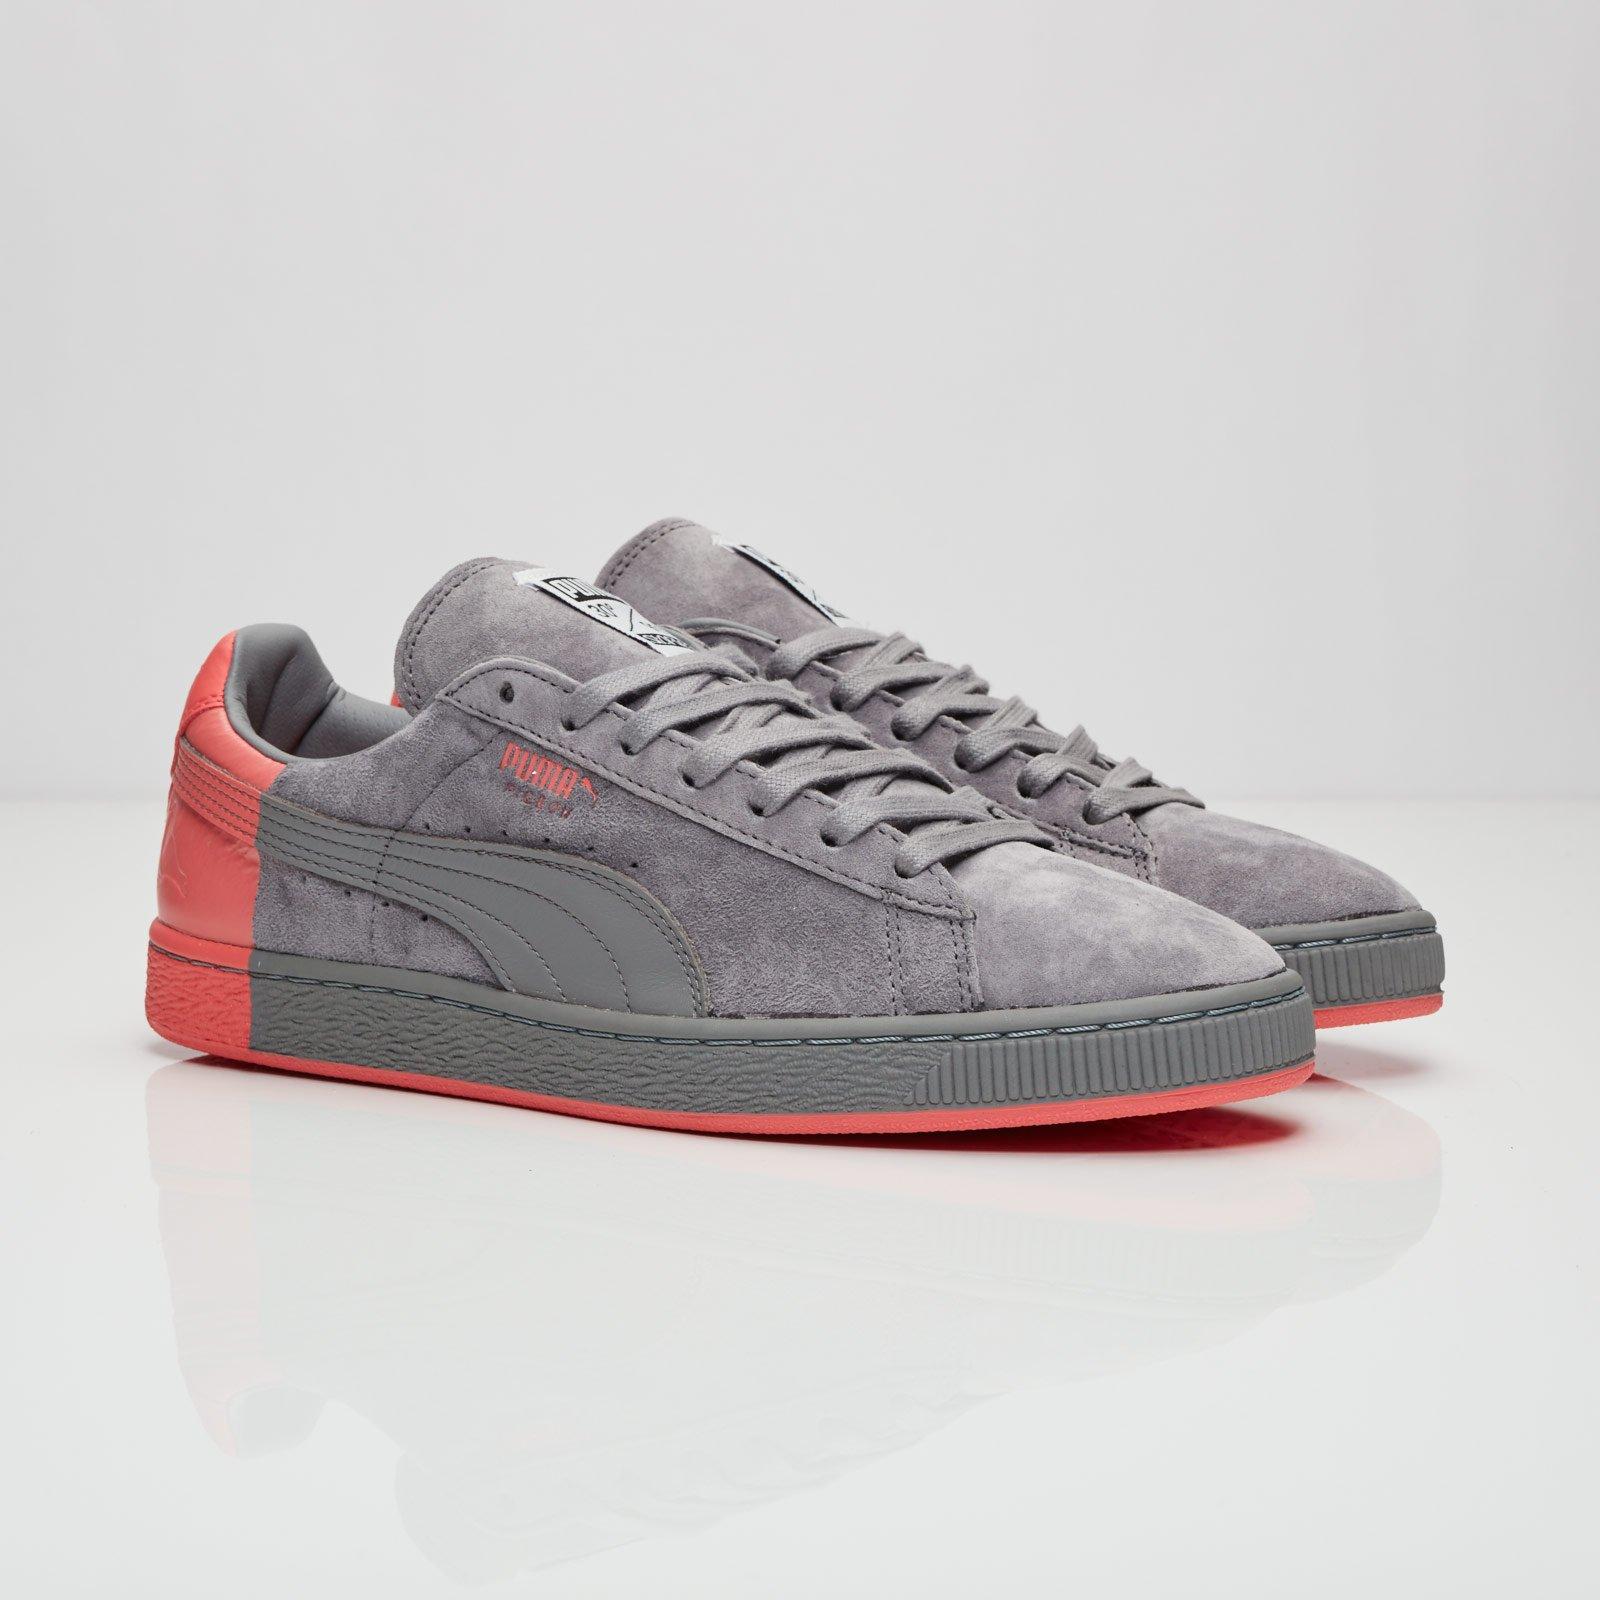 Puma Suede x Staple 361617 03 Sneakersnstuff I Sneakers